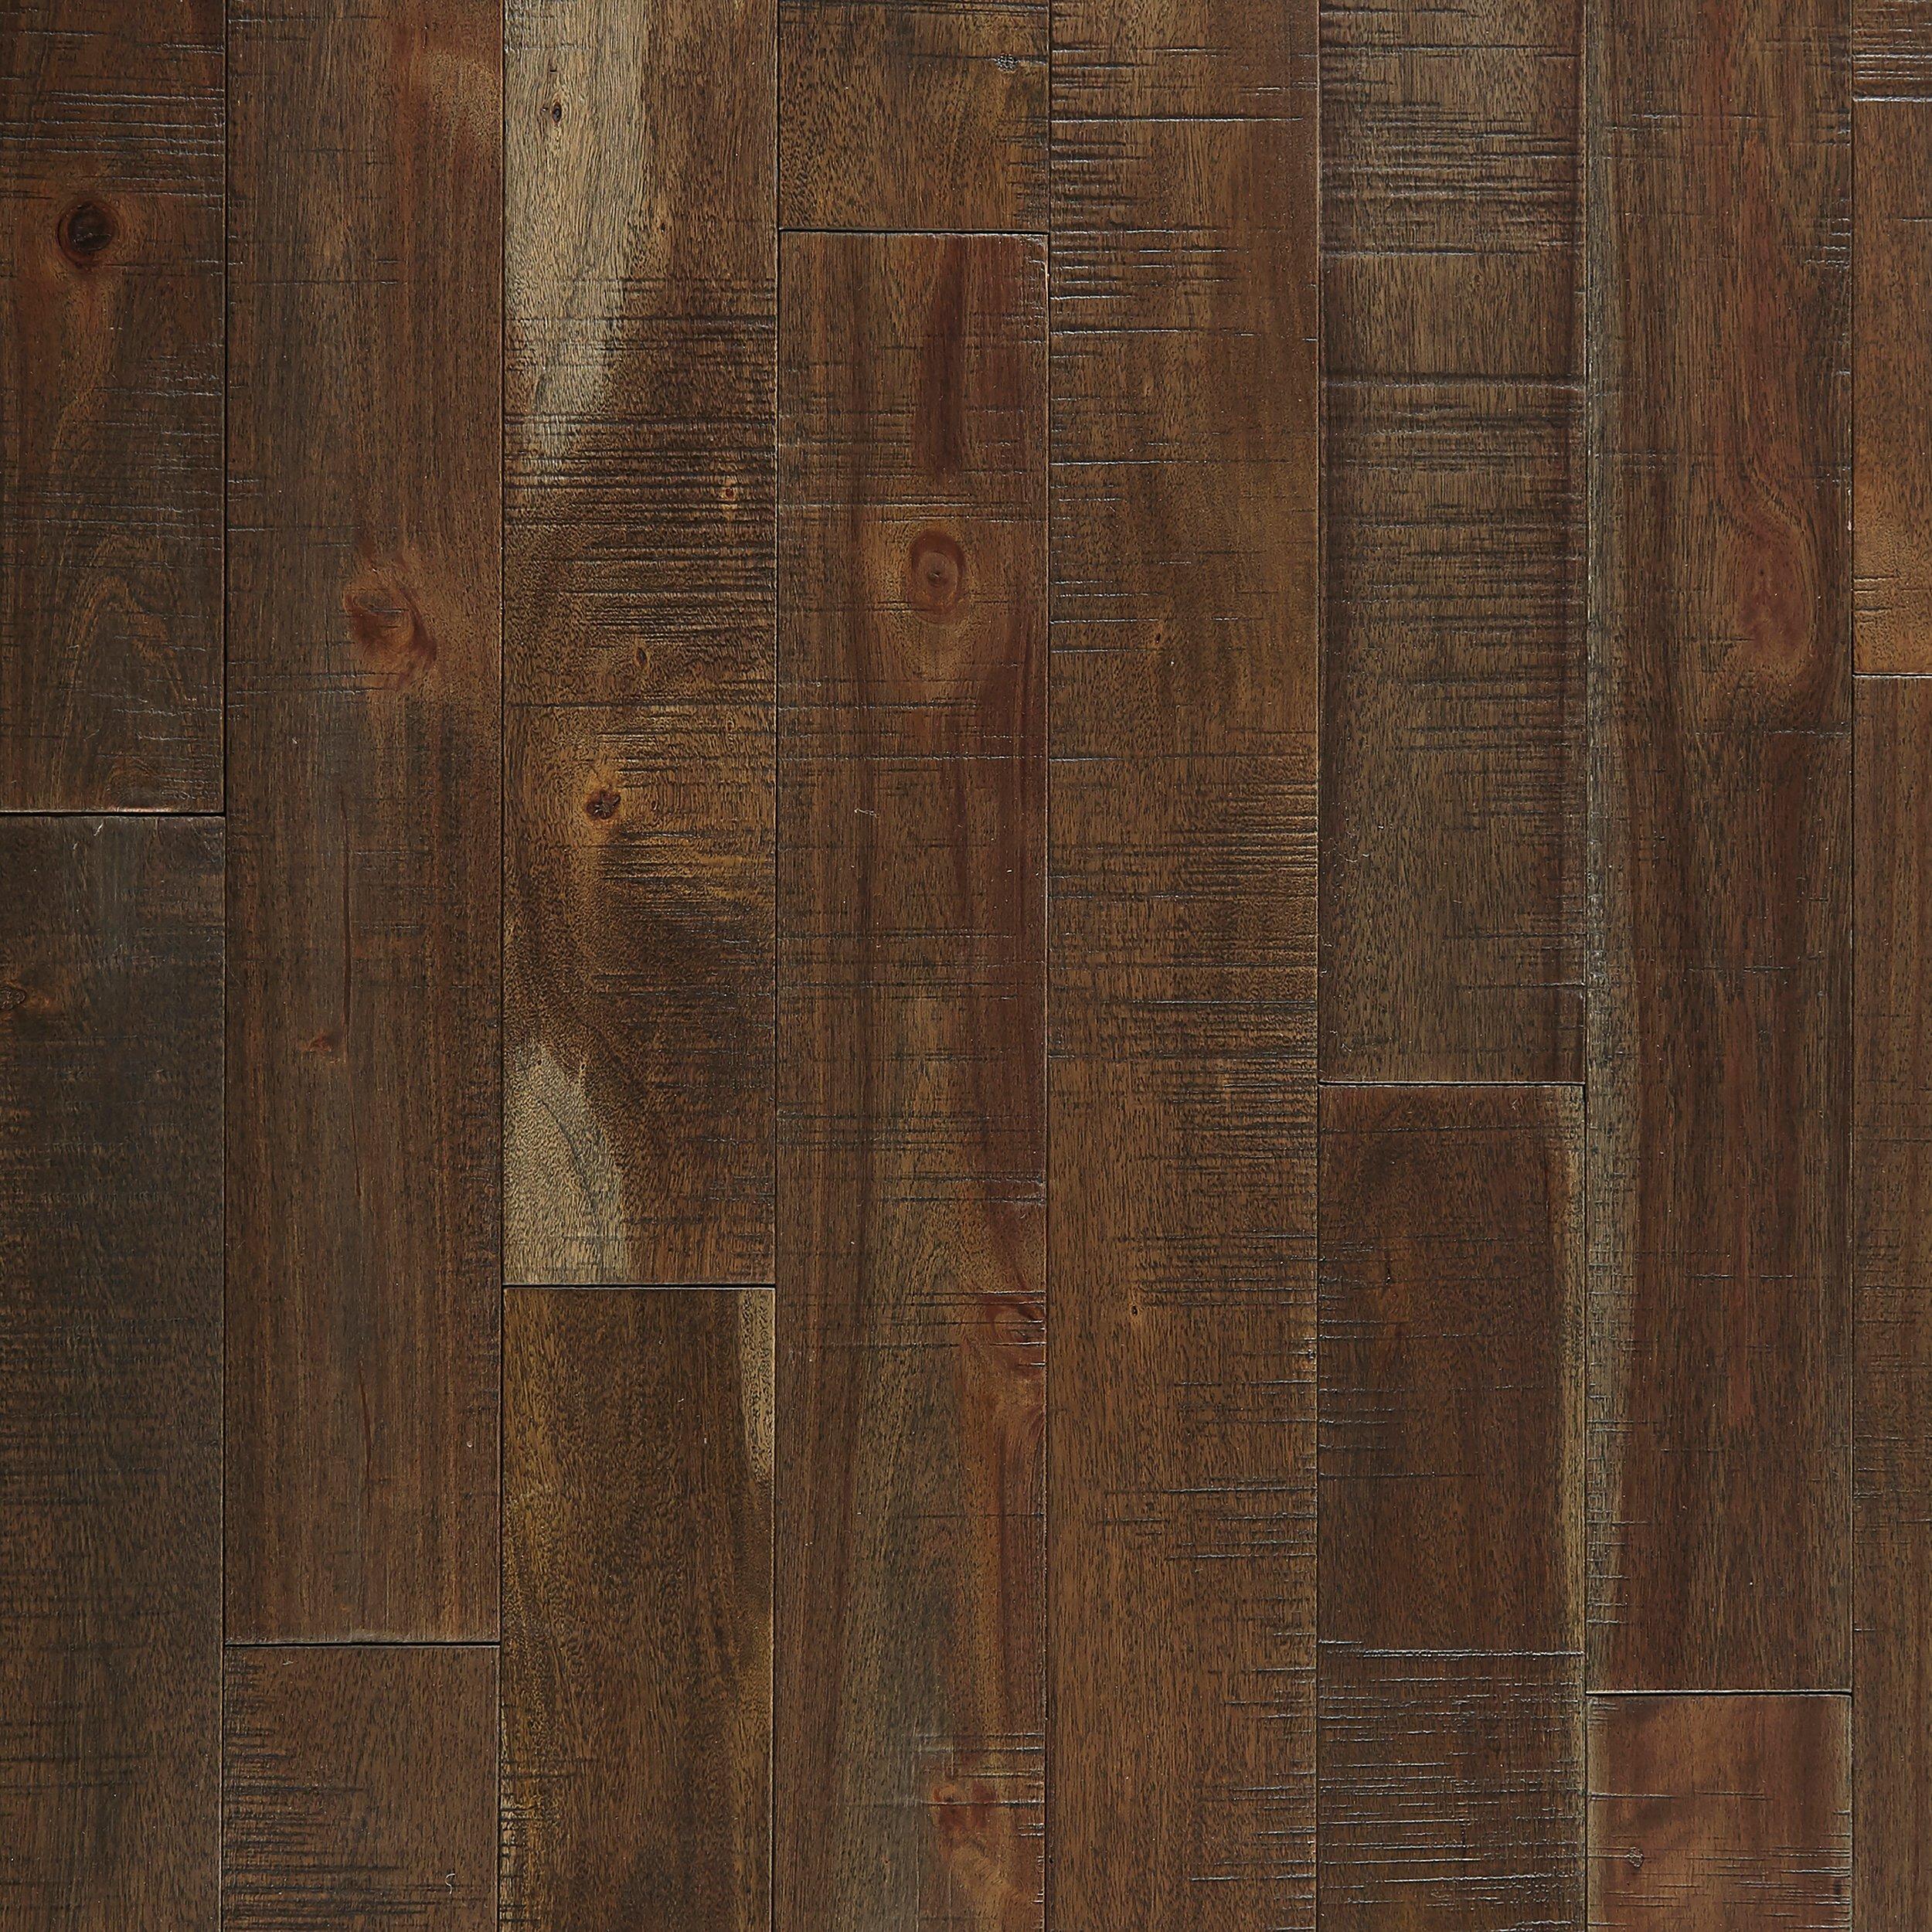 barn door acacia hand scraped solid hardwood - Hand Scraped Hardwood